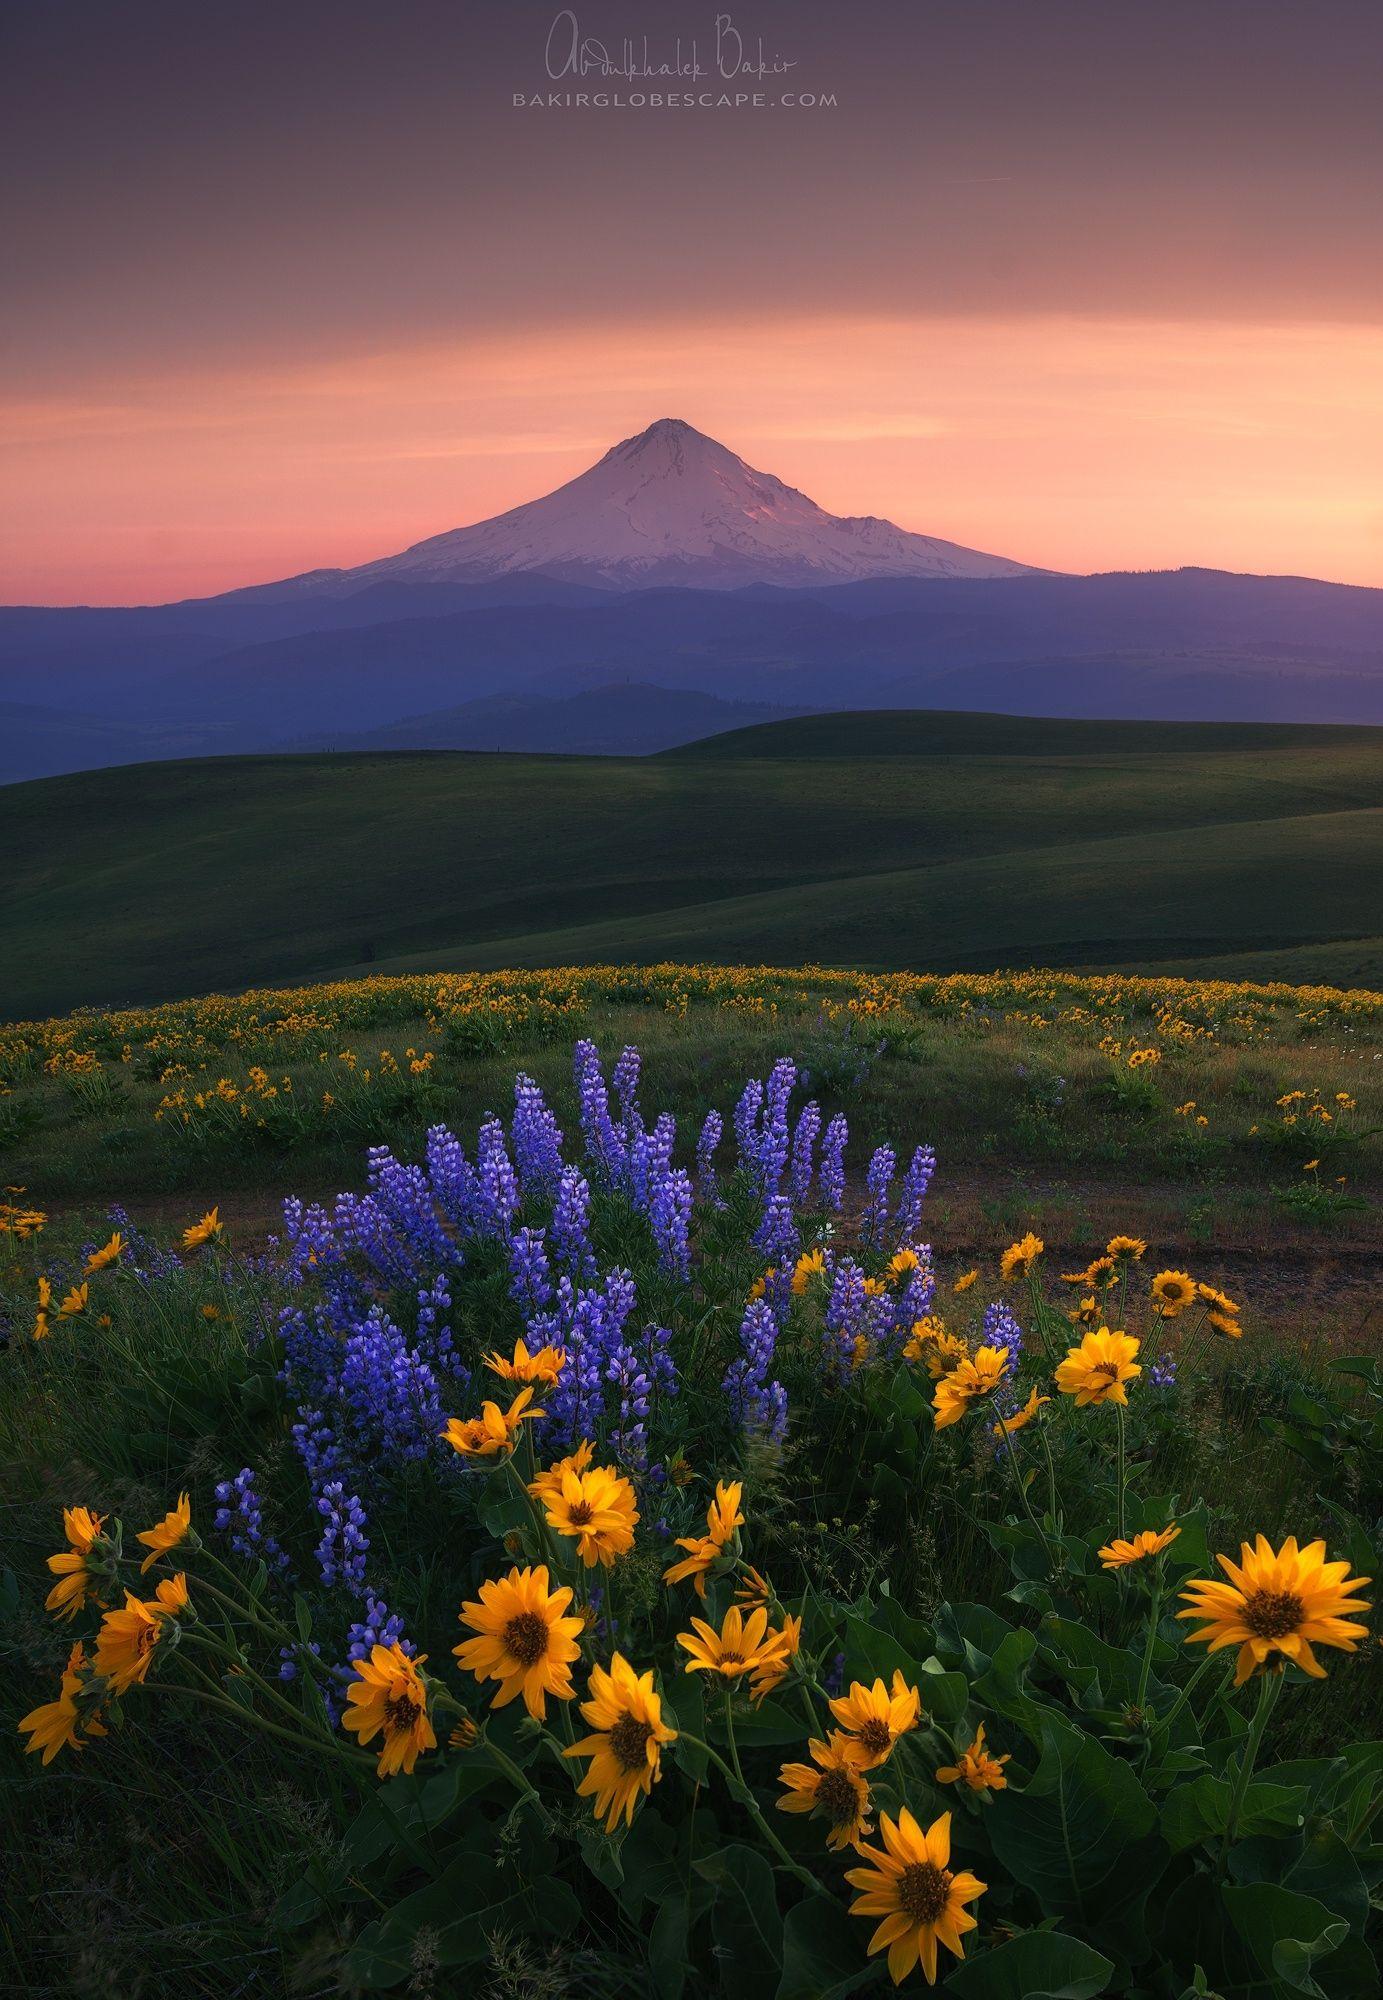 OREGON Colombia hills - bloom landscape #washington flowers mountain #wildflowers